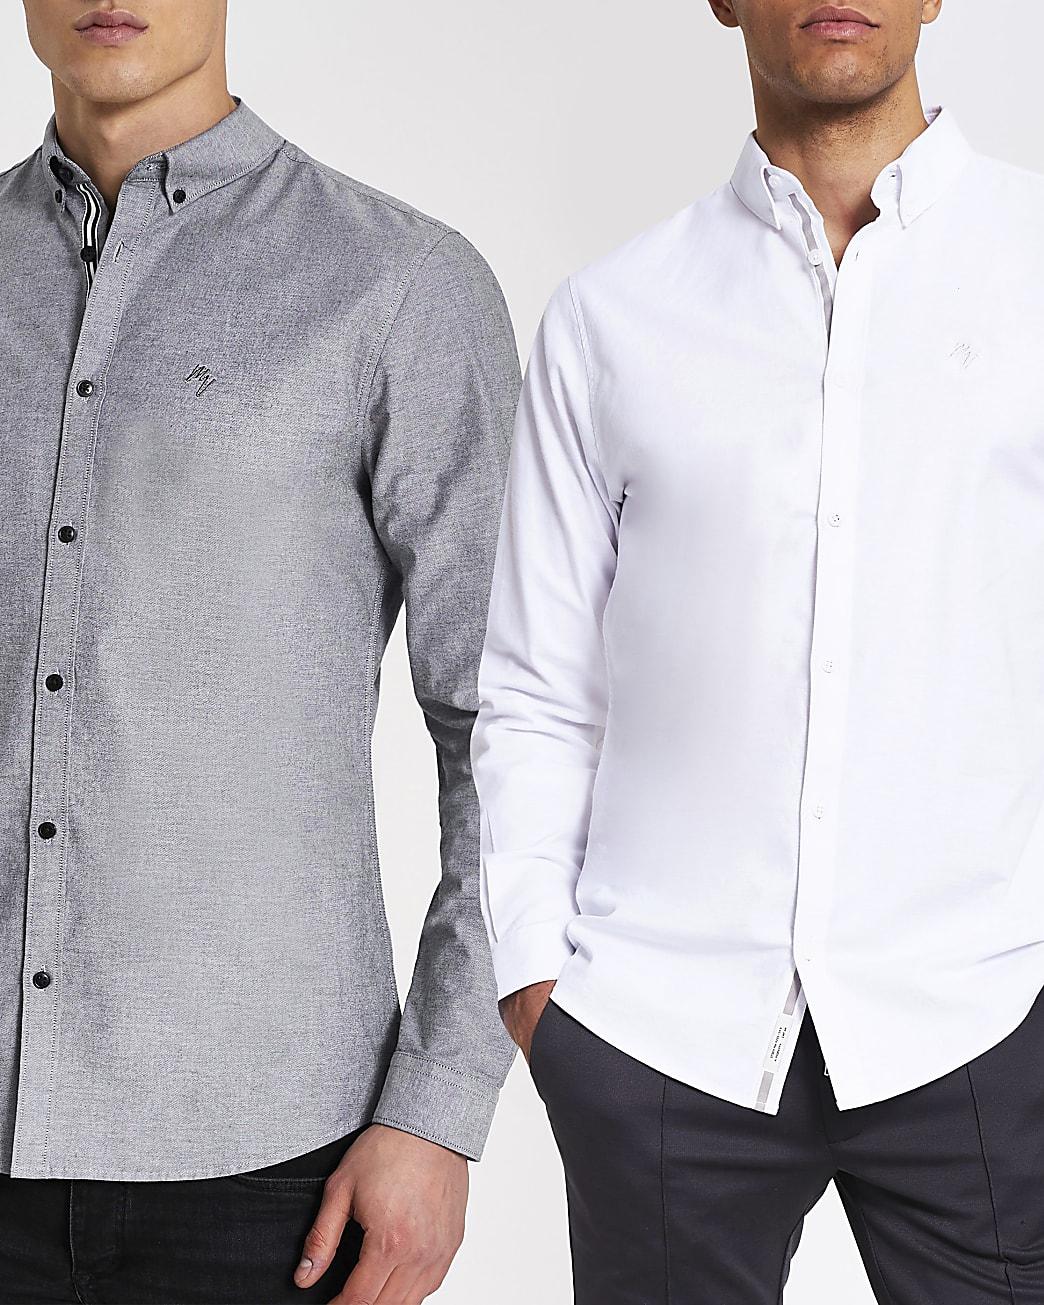 Maison Riviera grey long sleeve shirt 2 pack